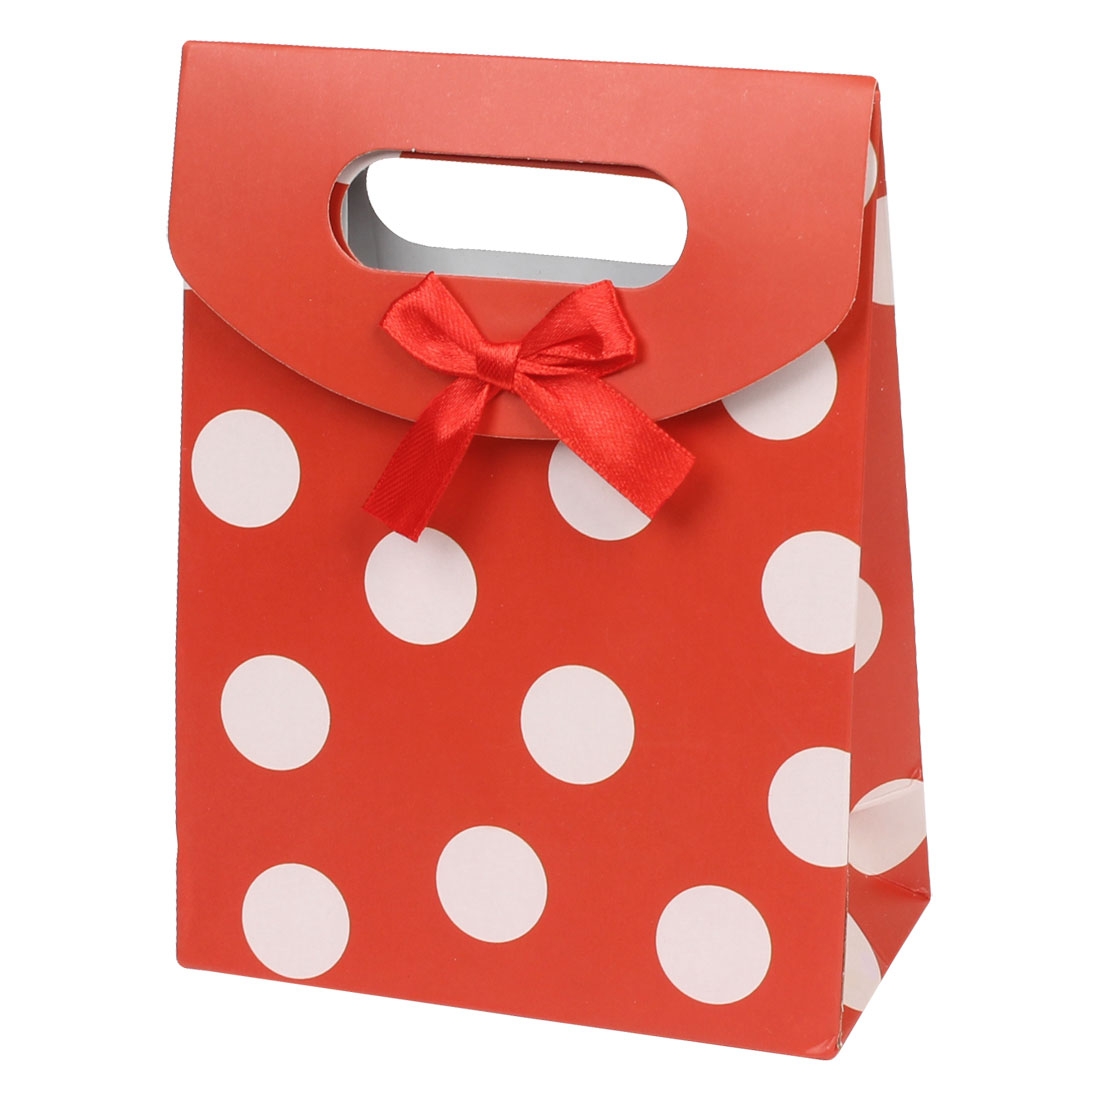 Fastener Closure White Circle Print Paper Gift Holder Bag Red